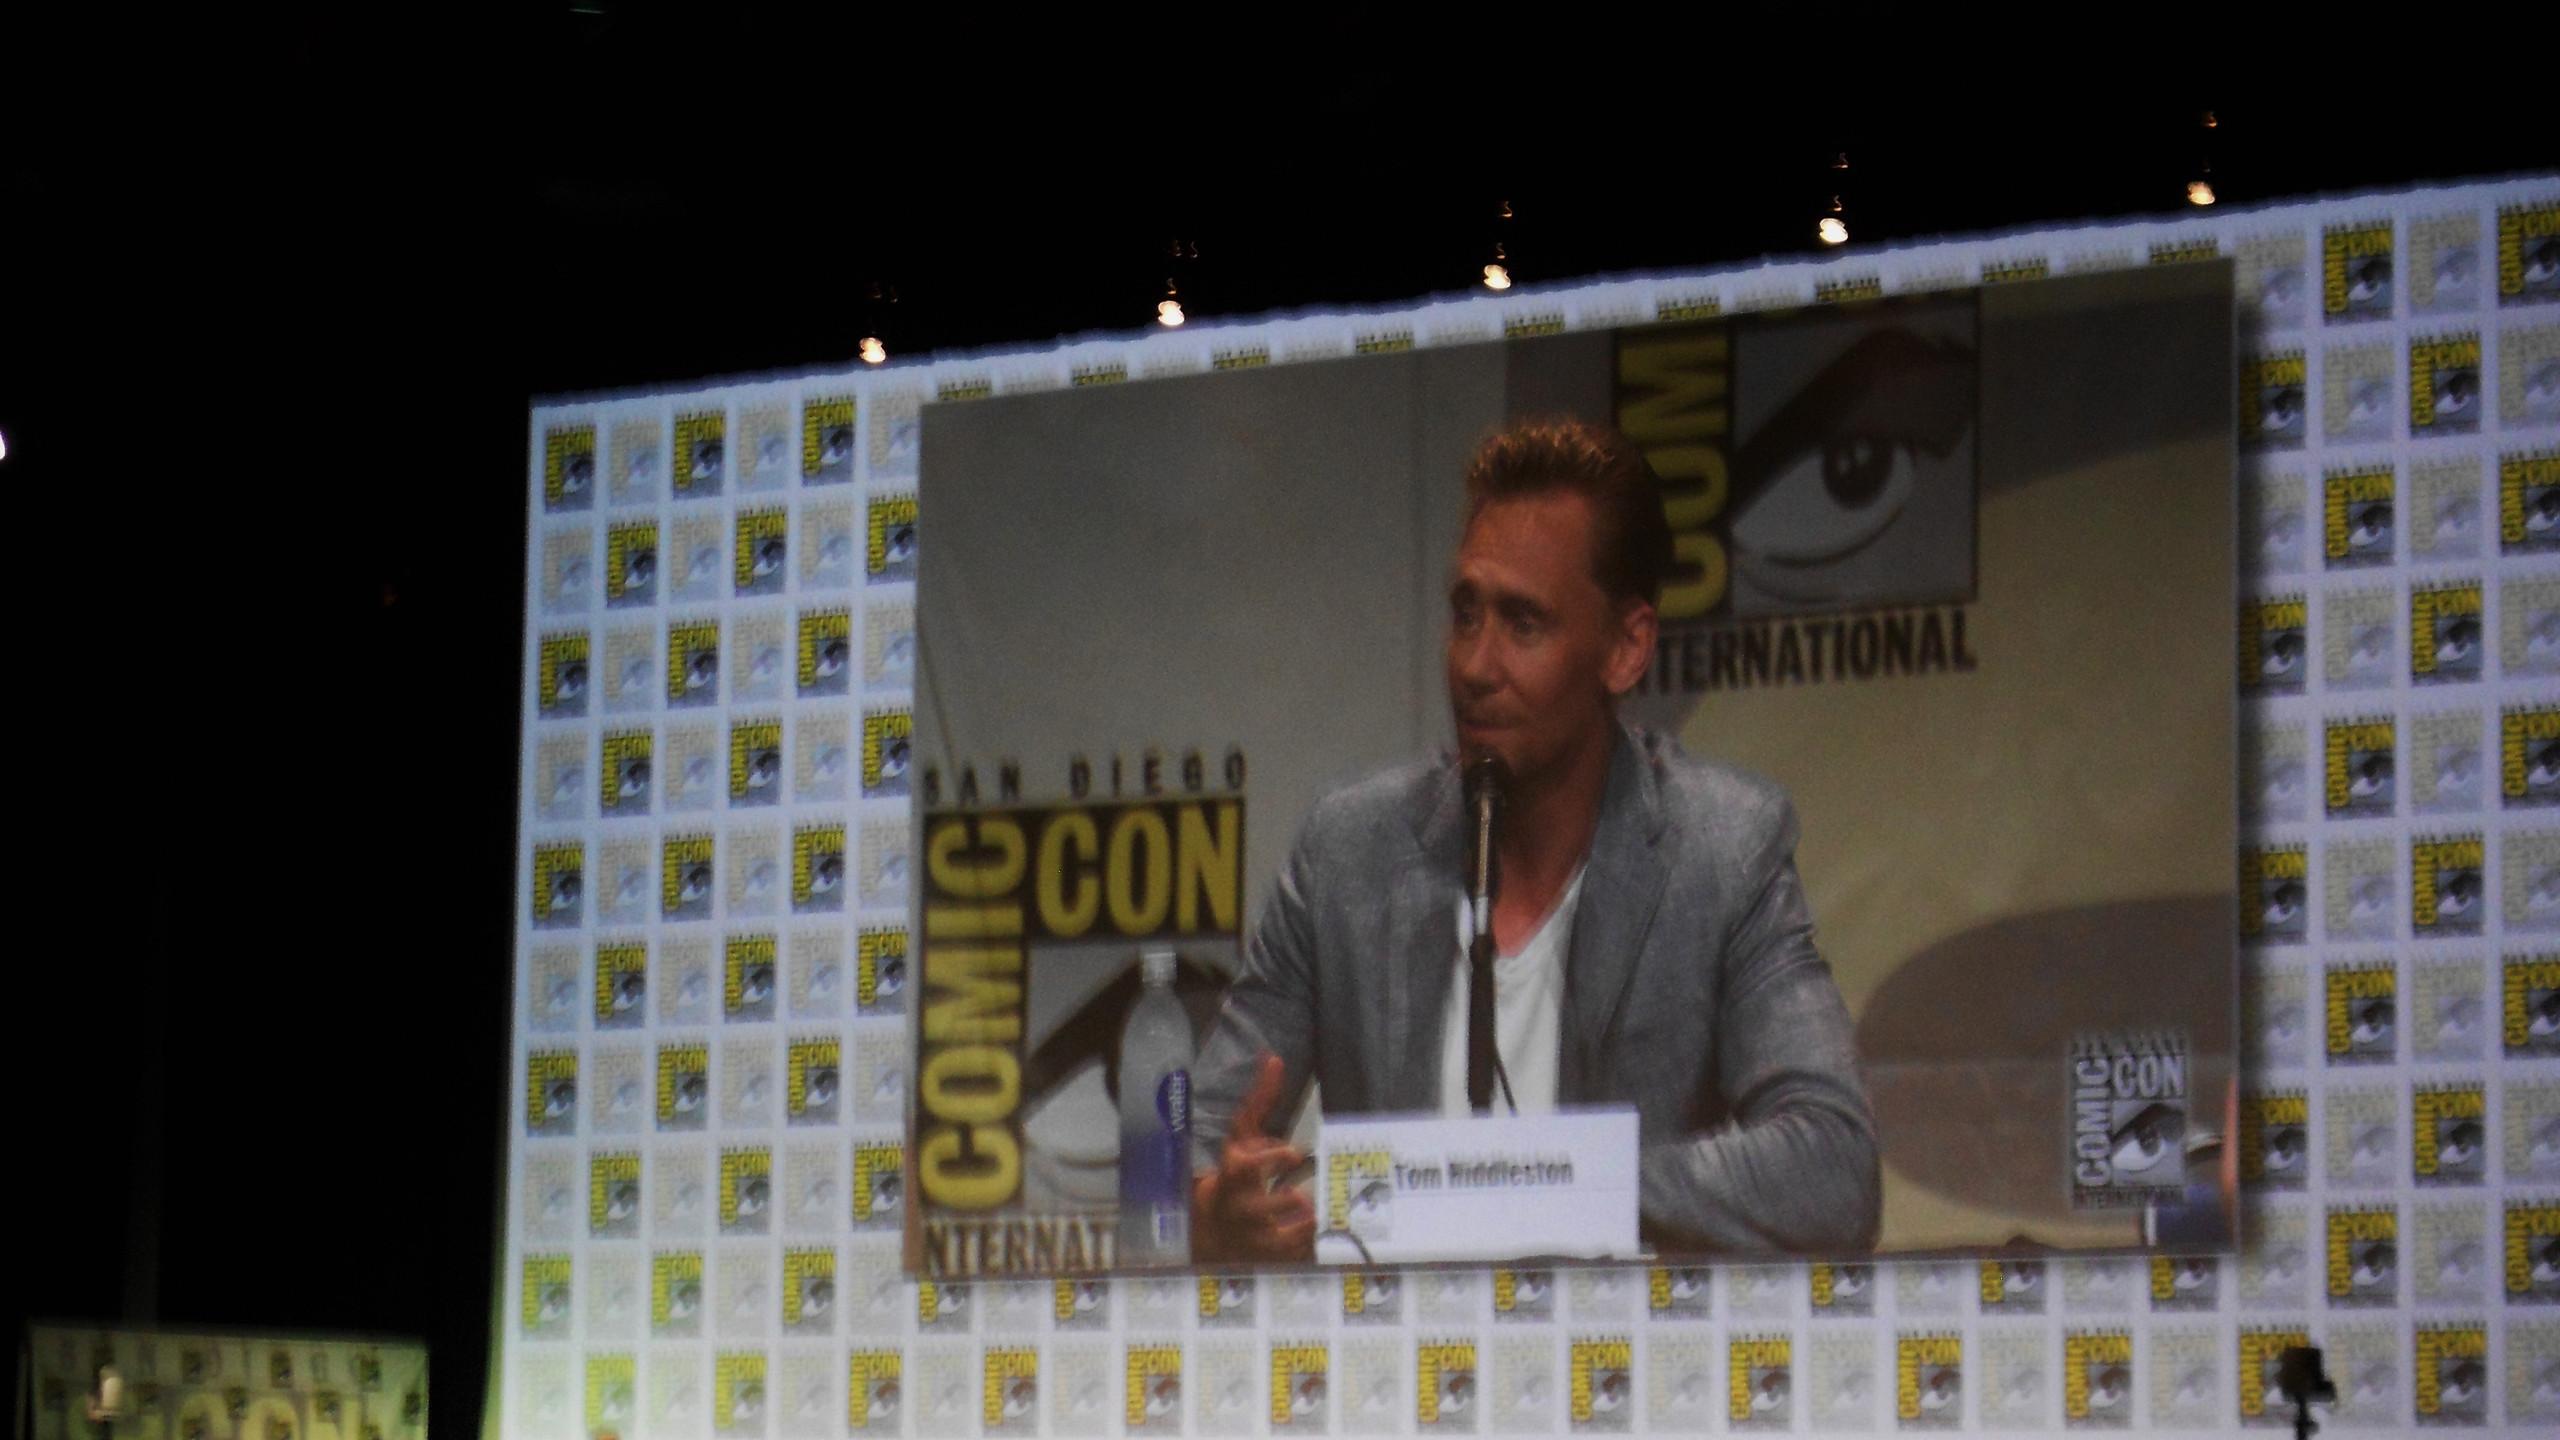 San Diego, Comic-Con, convention, SDCC, Tom Hiddleston